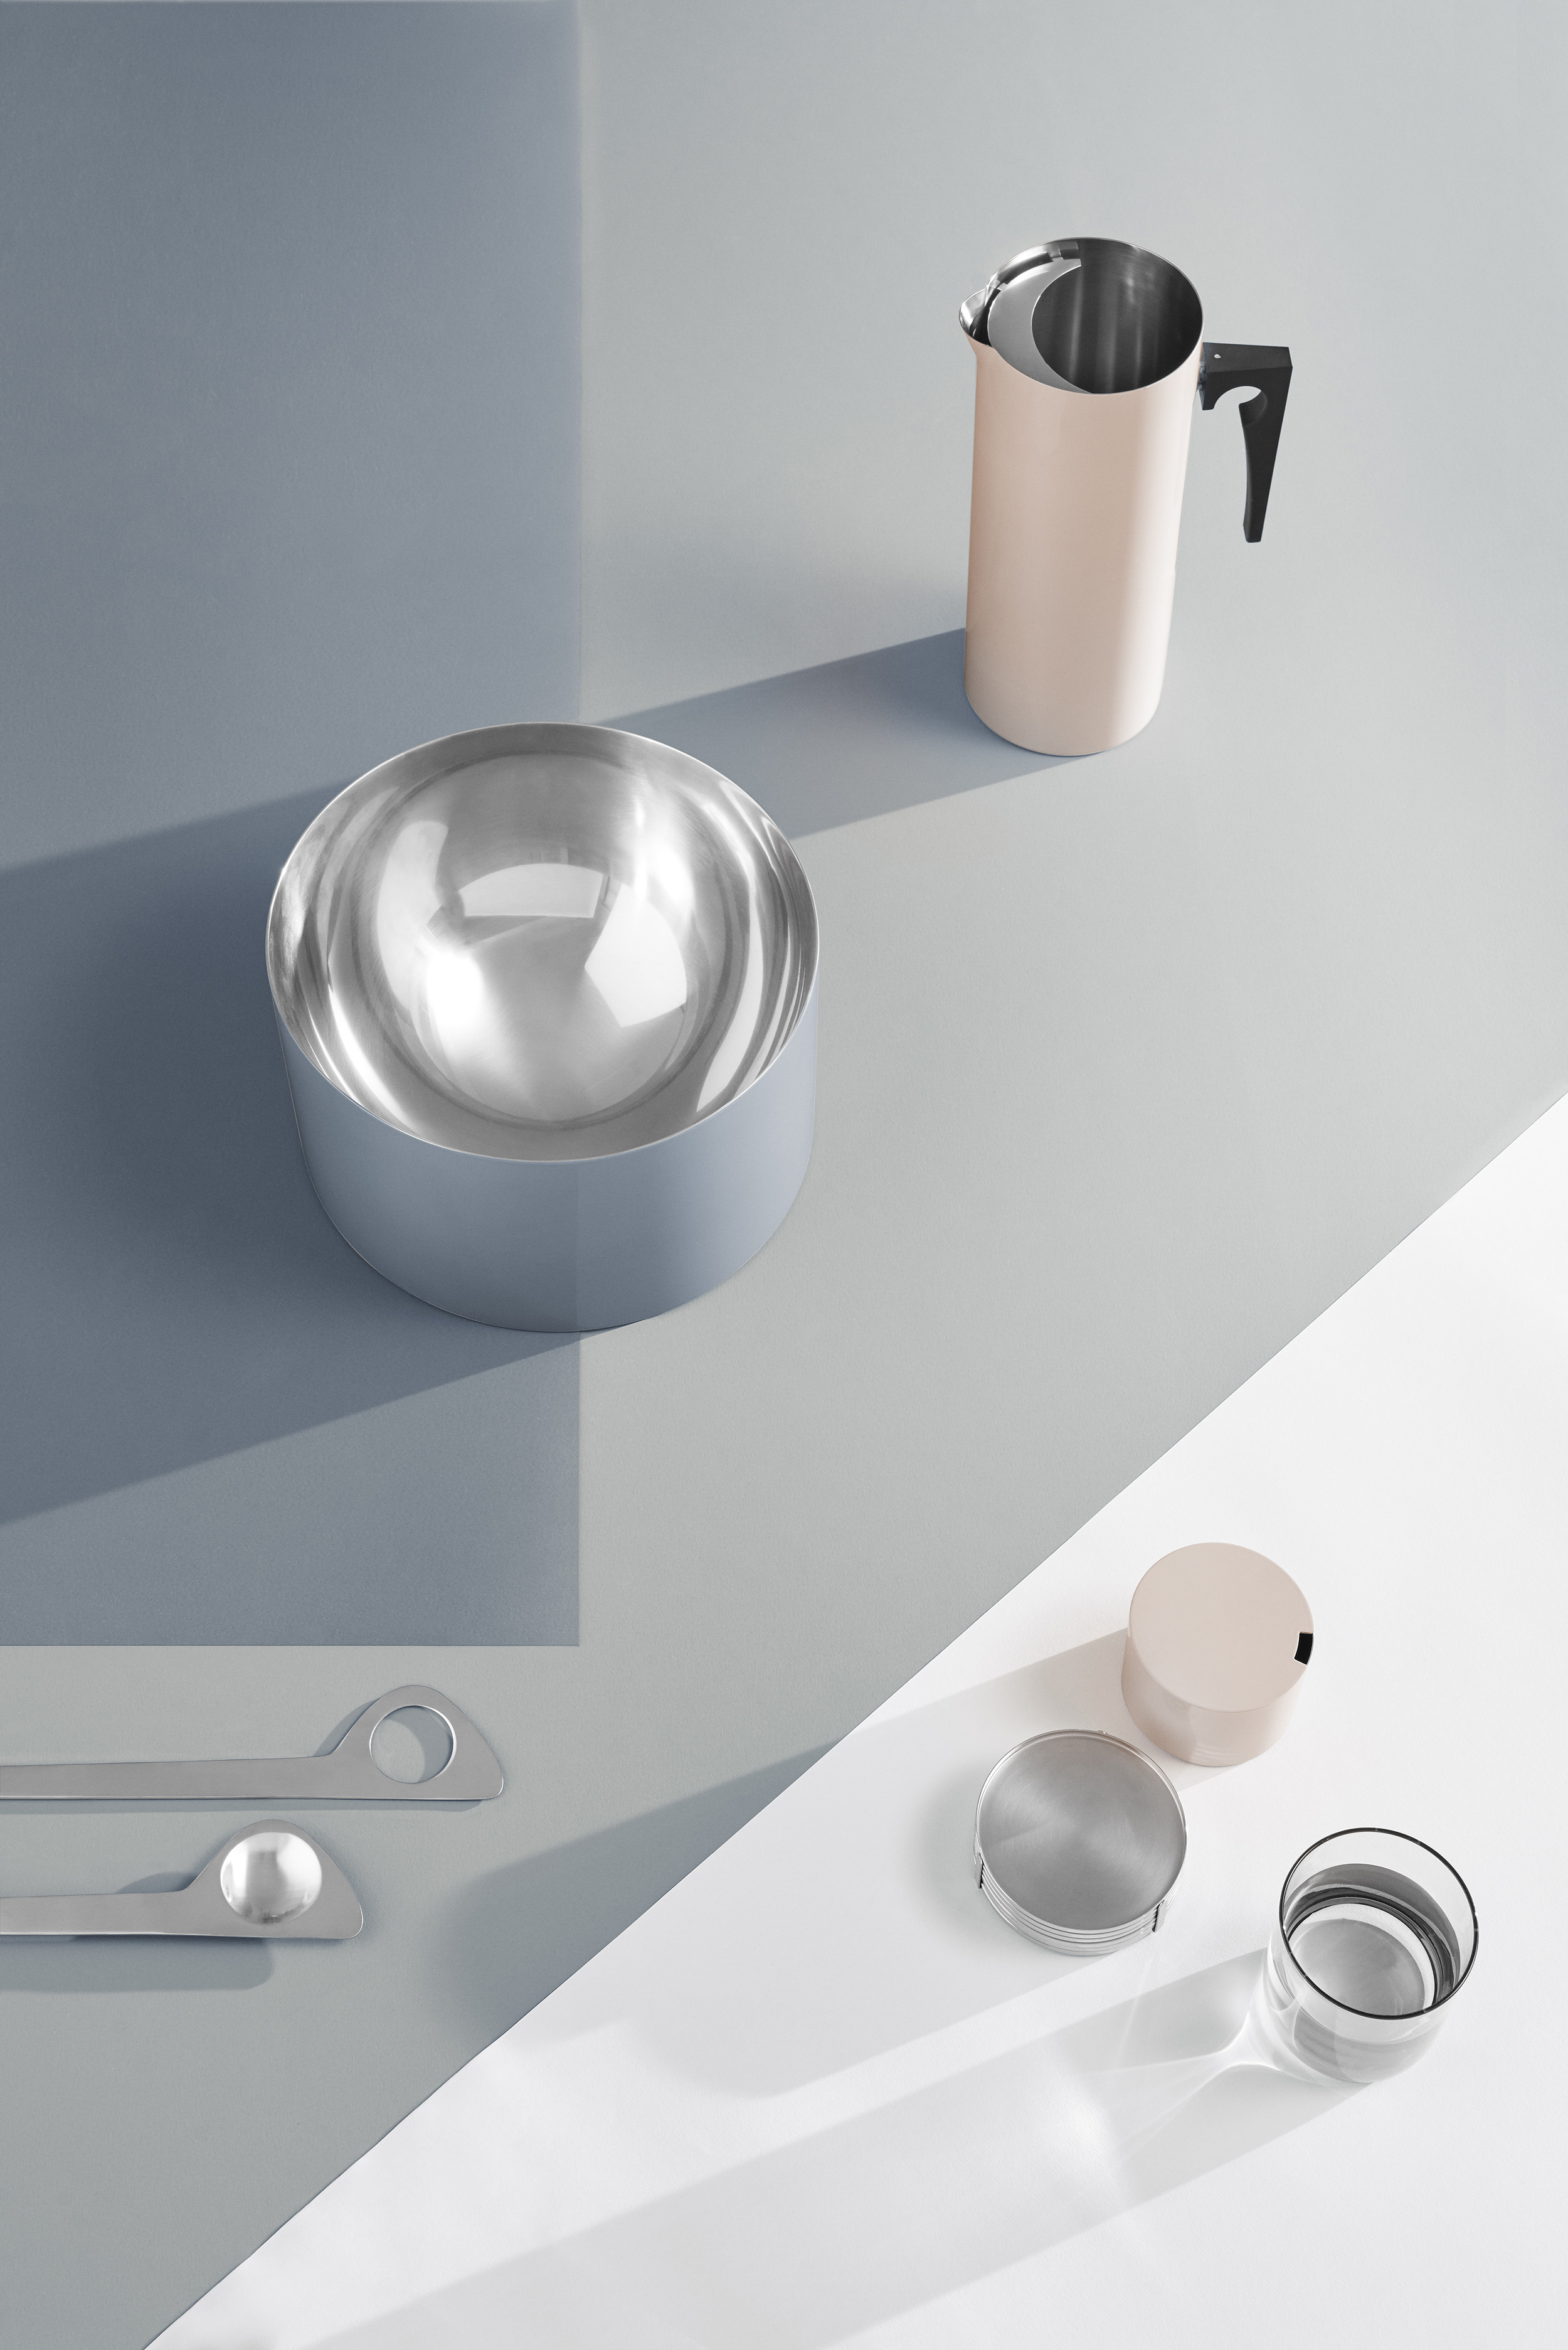 Conceptual styling Danish deisgn